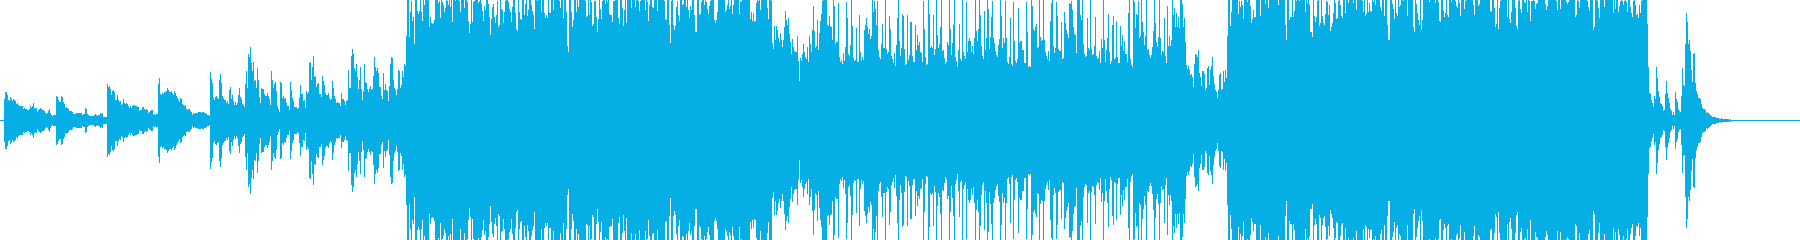 CM等に合いそうな幻想的アンビエント曲の再生済みの波形